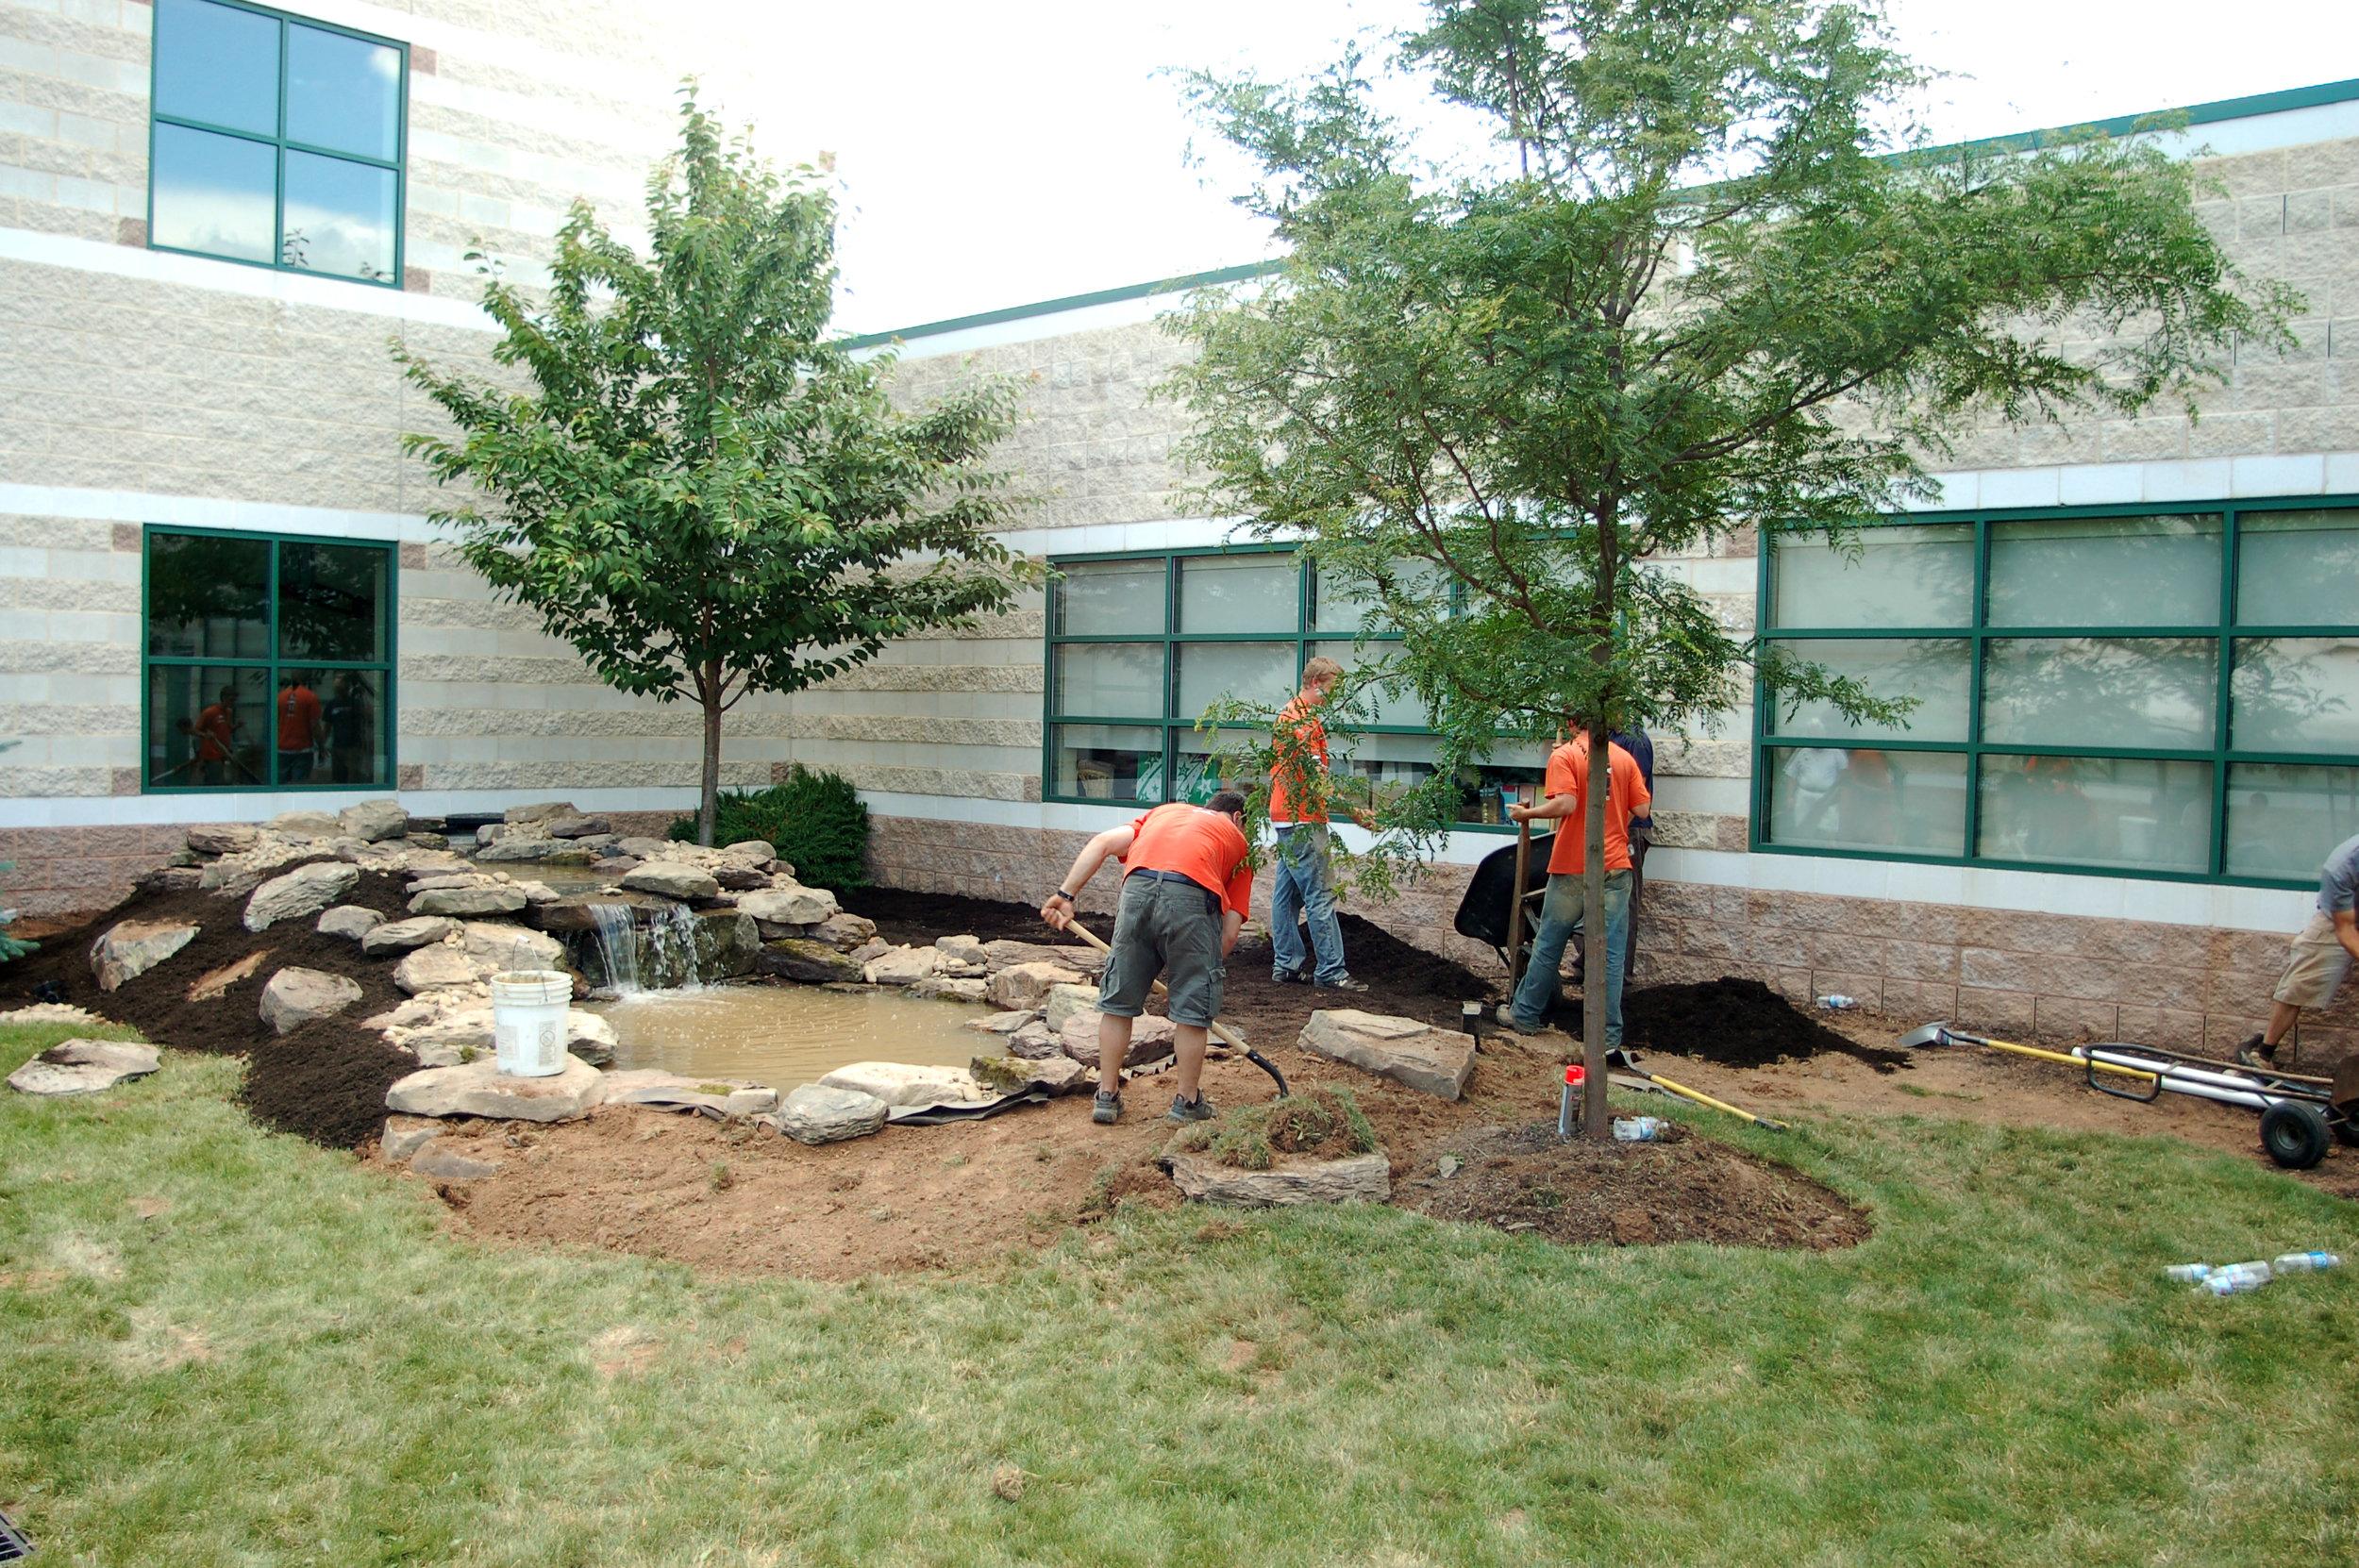 Pondworks_community_Design build_project_custom_Pond_PennView Christian School_03.JPG